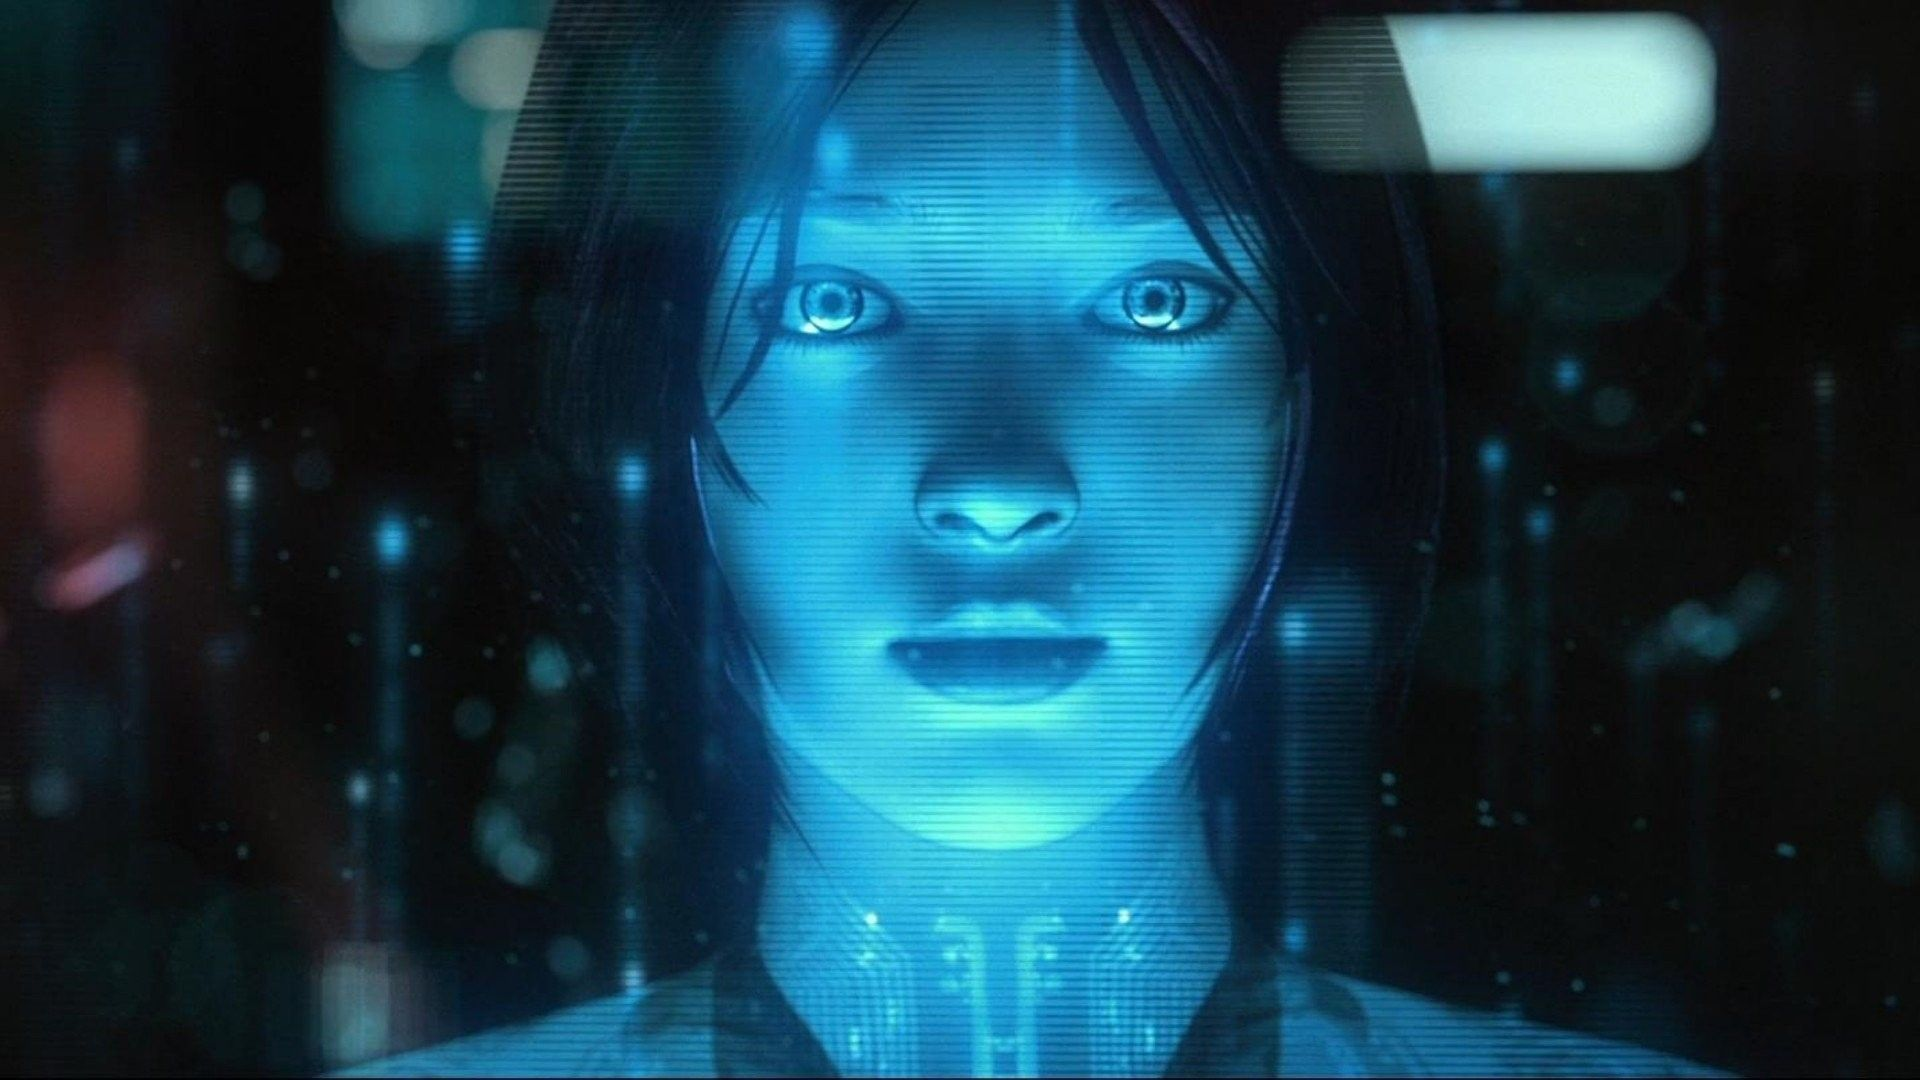 Cortana Wallpapers Top Free Cortana Backgrounds